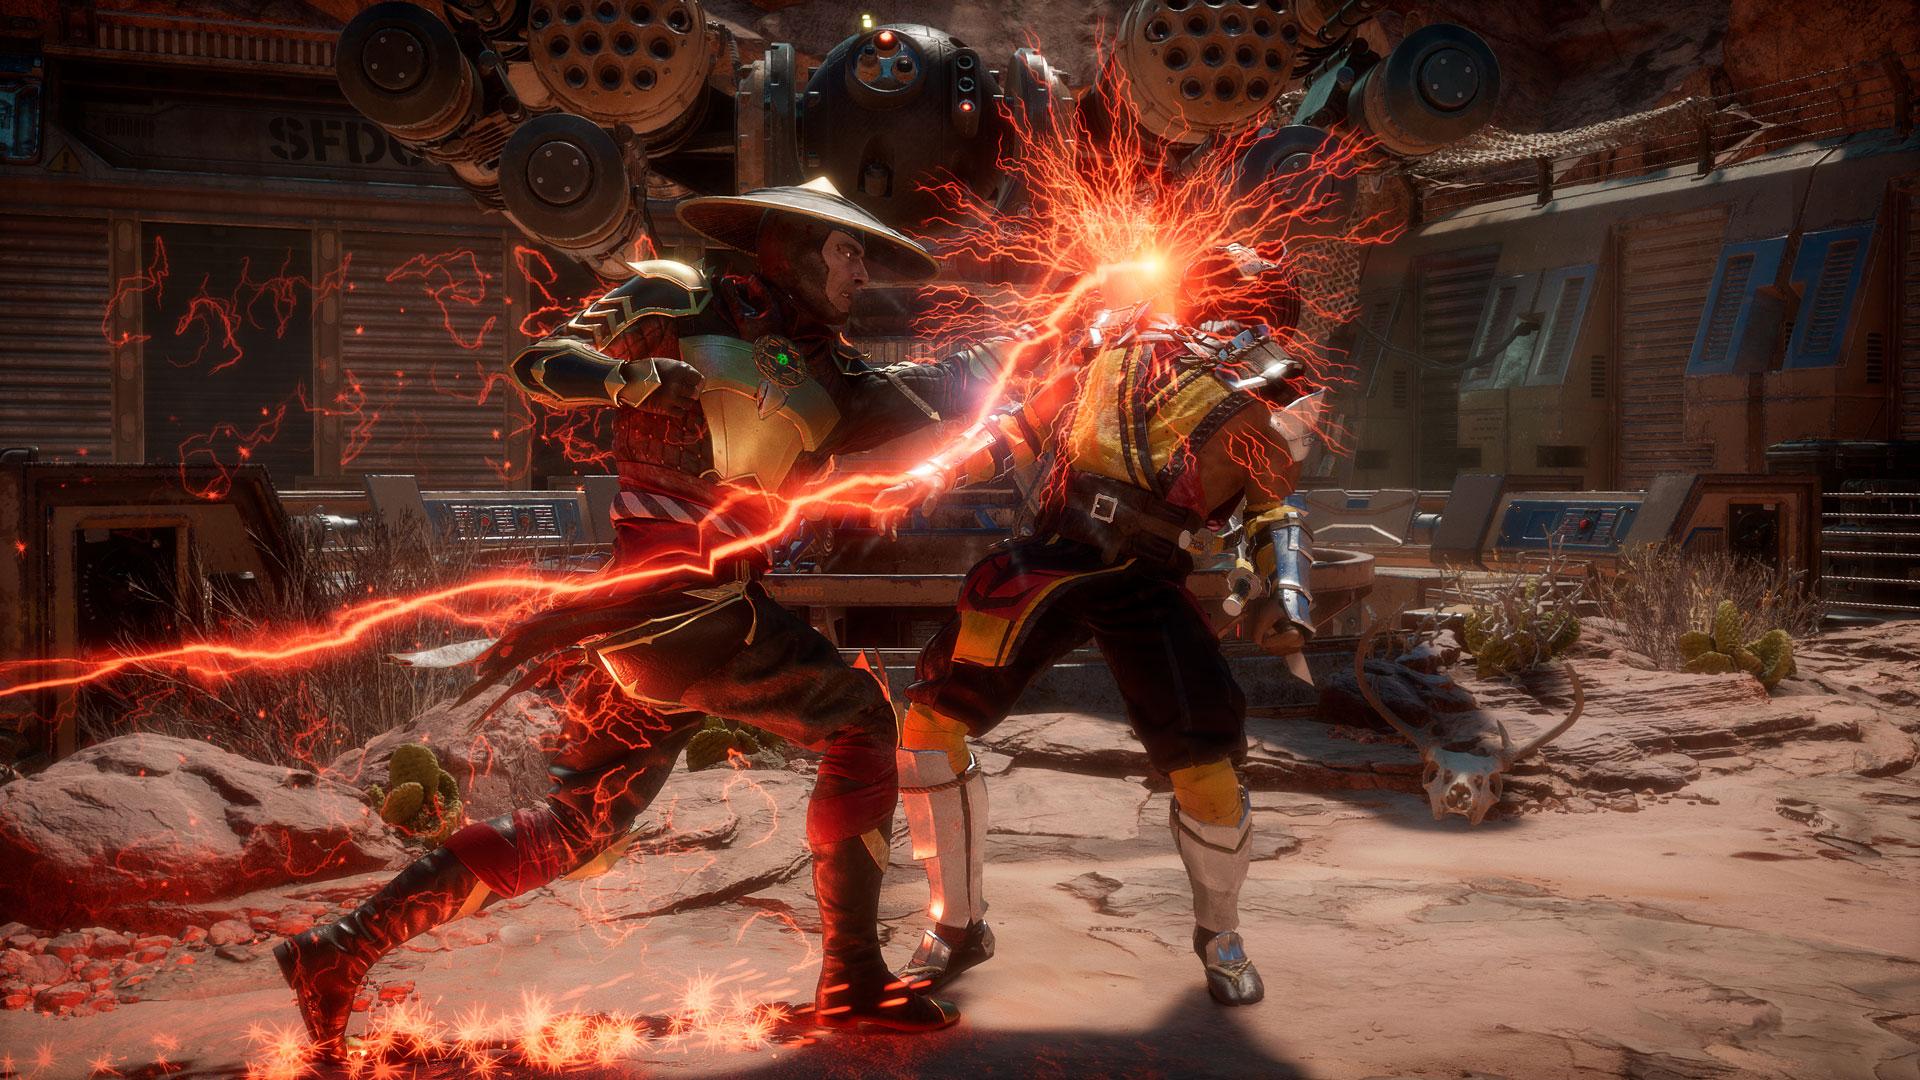 Image from Mortal Kombat 11 - Can't wait for Mortal Kombat 12